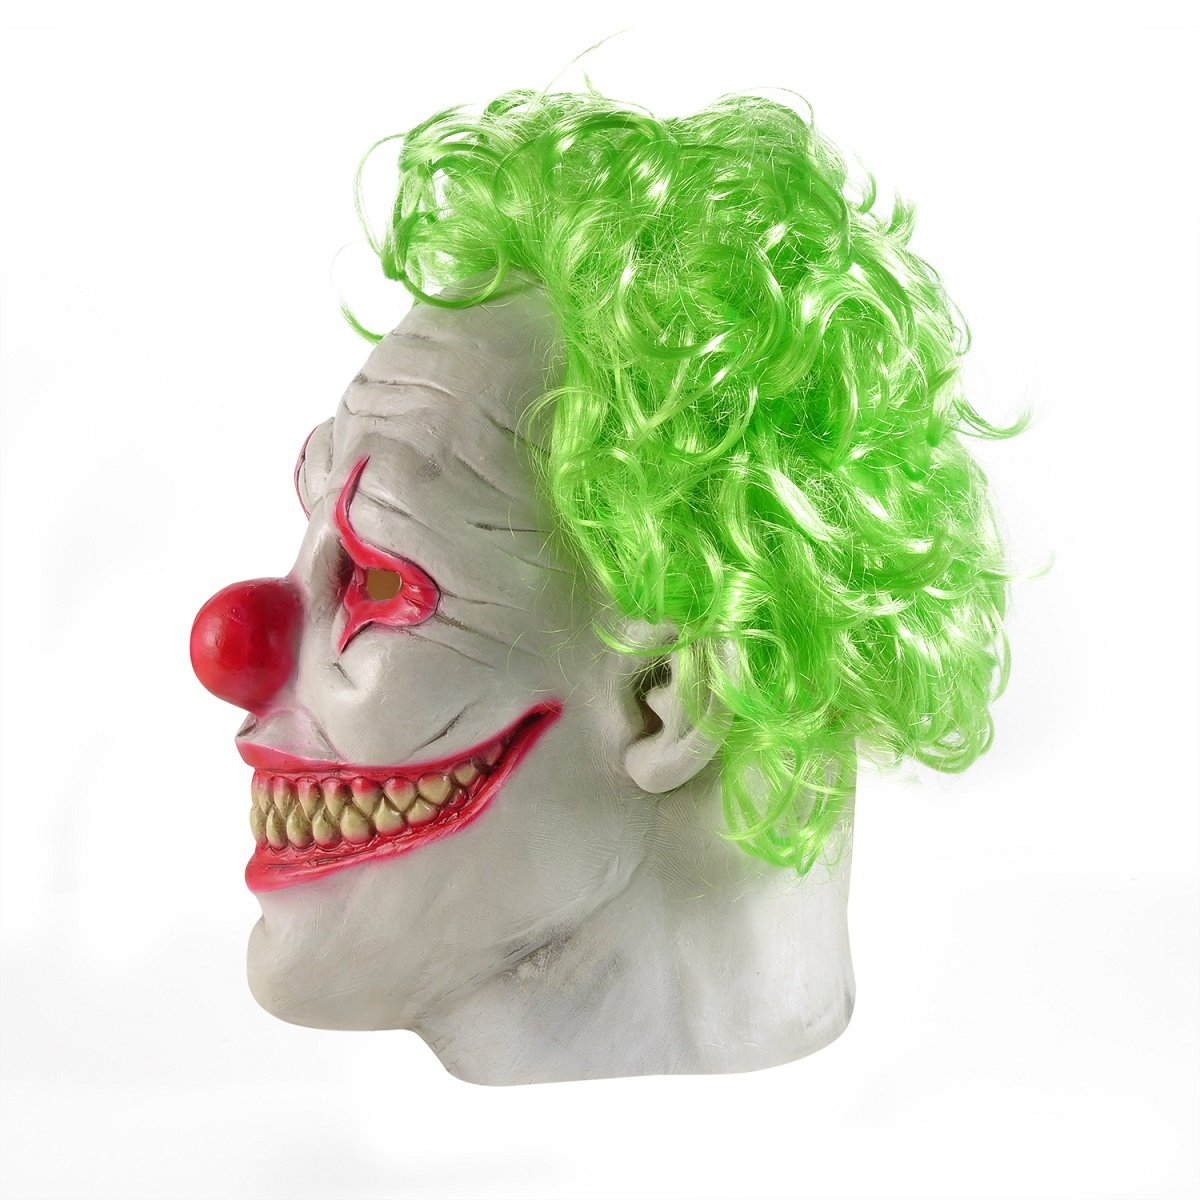 Amazon.com: Joker Mask, Halloween Latex Clown Mask for Adults ...